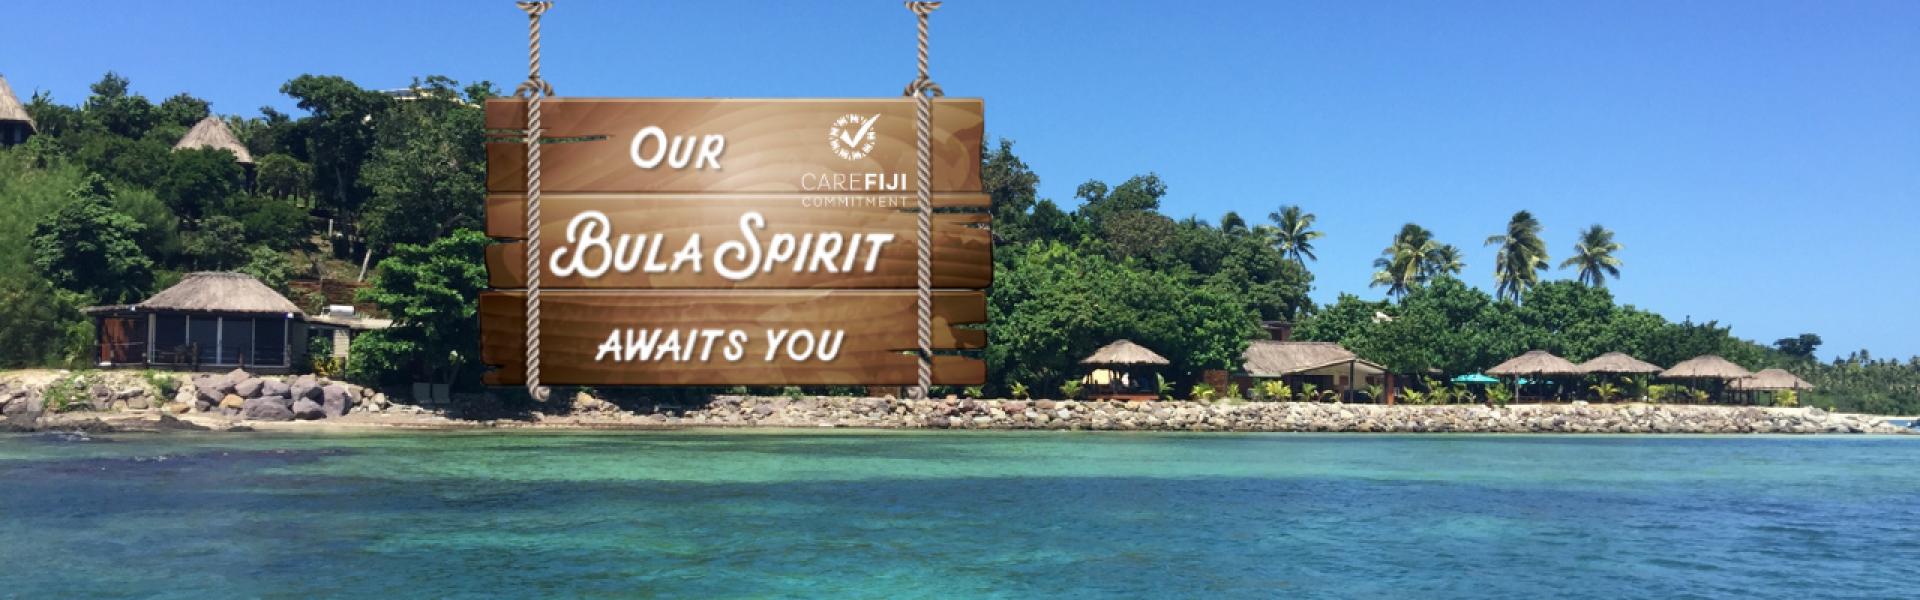 Our Bula Spirit